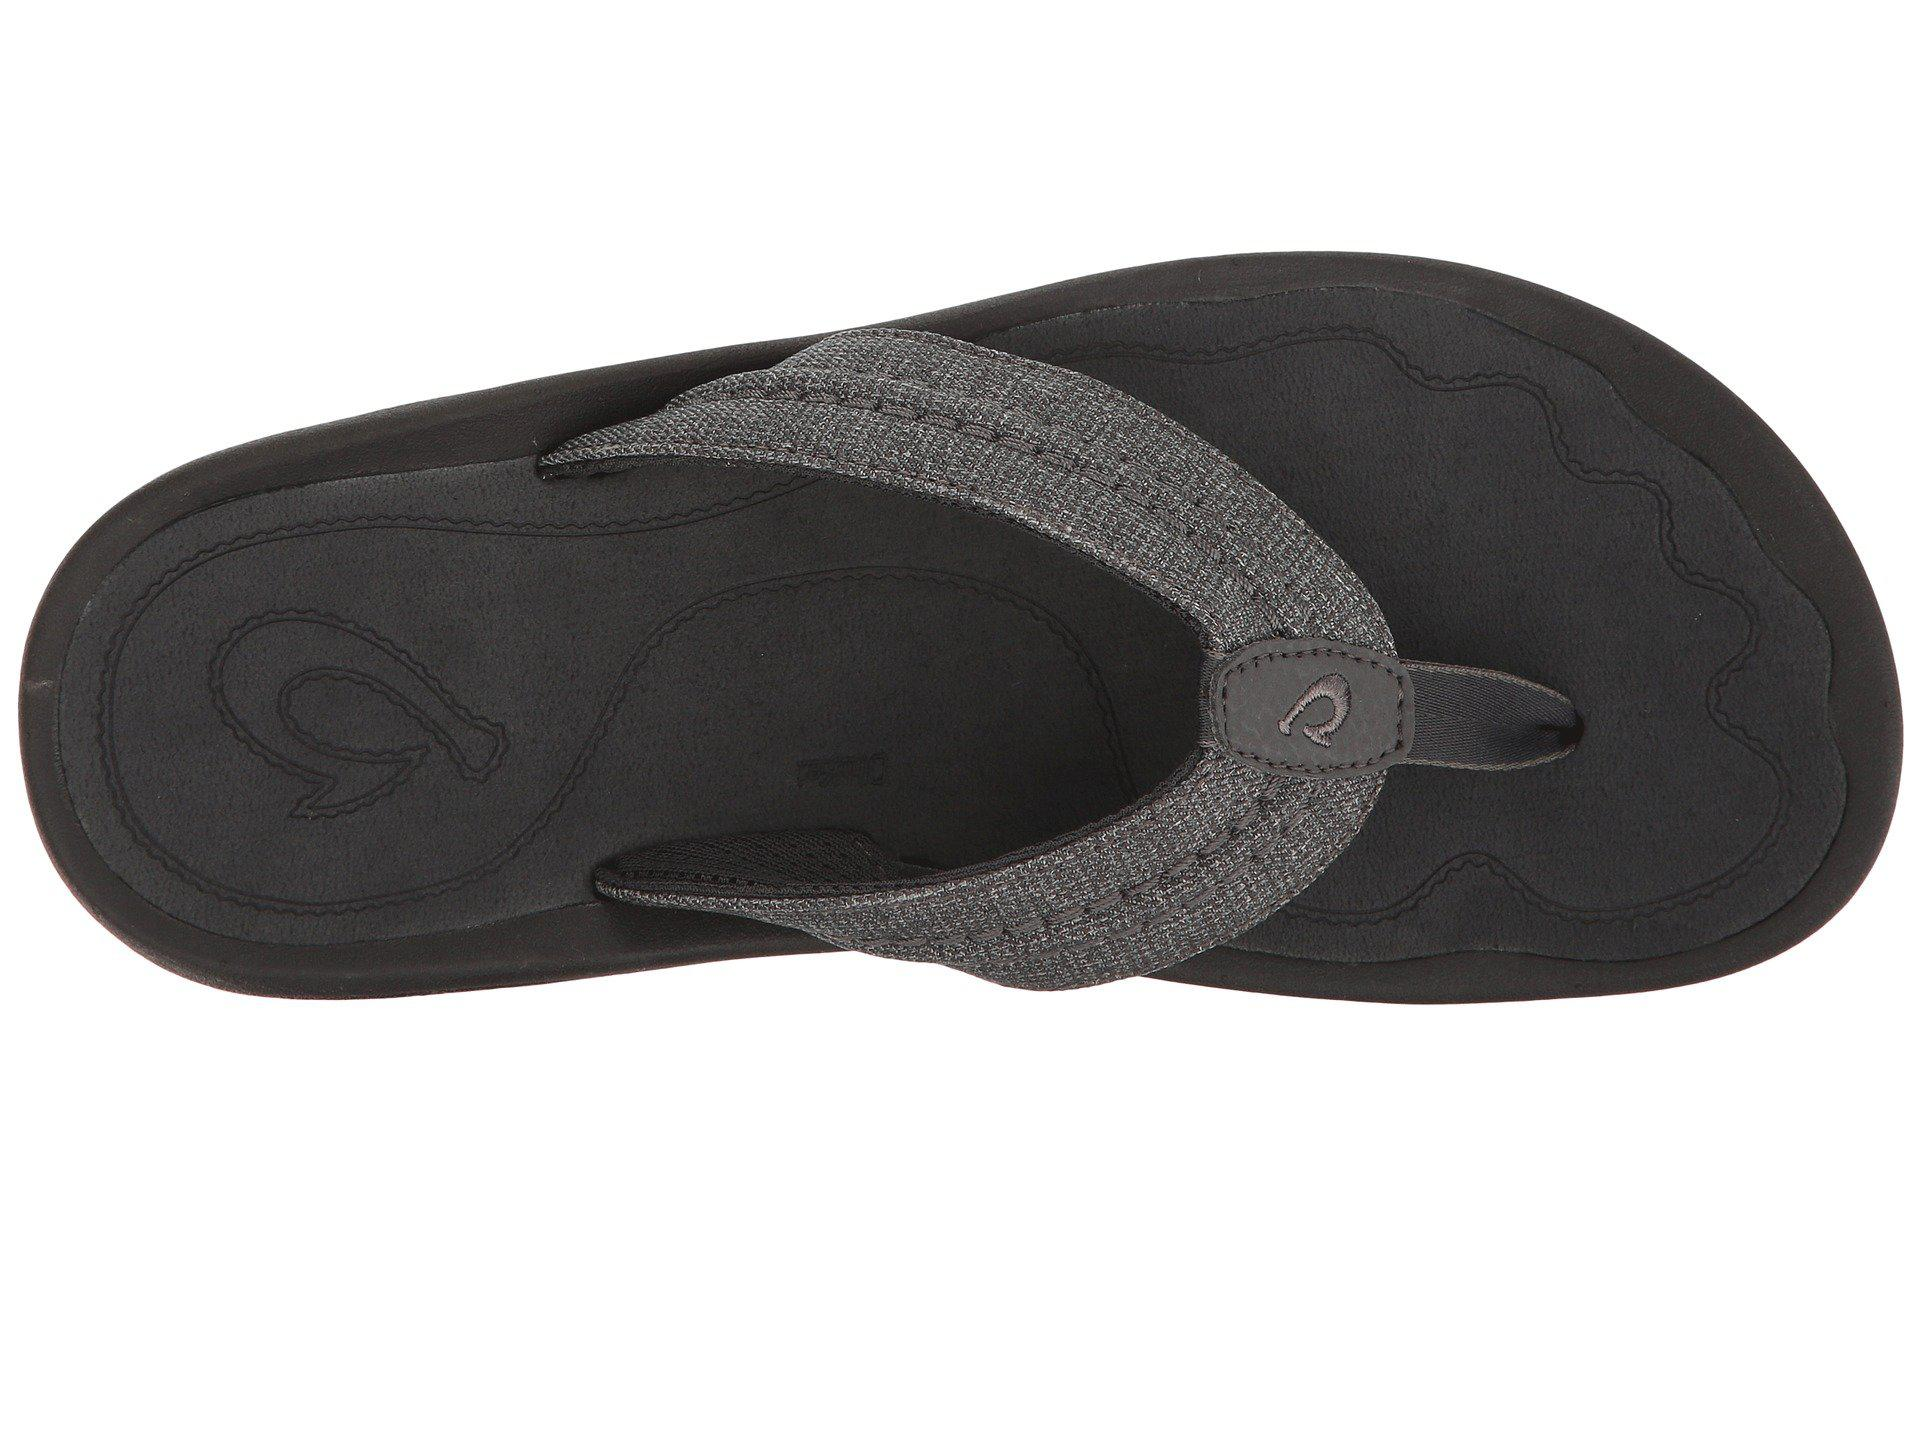 72e2f89dc544 Olukai - Black Hokua Mesh (dark Shadow) Men s Sandals for Men - Lyst. View  fullscreen